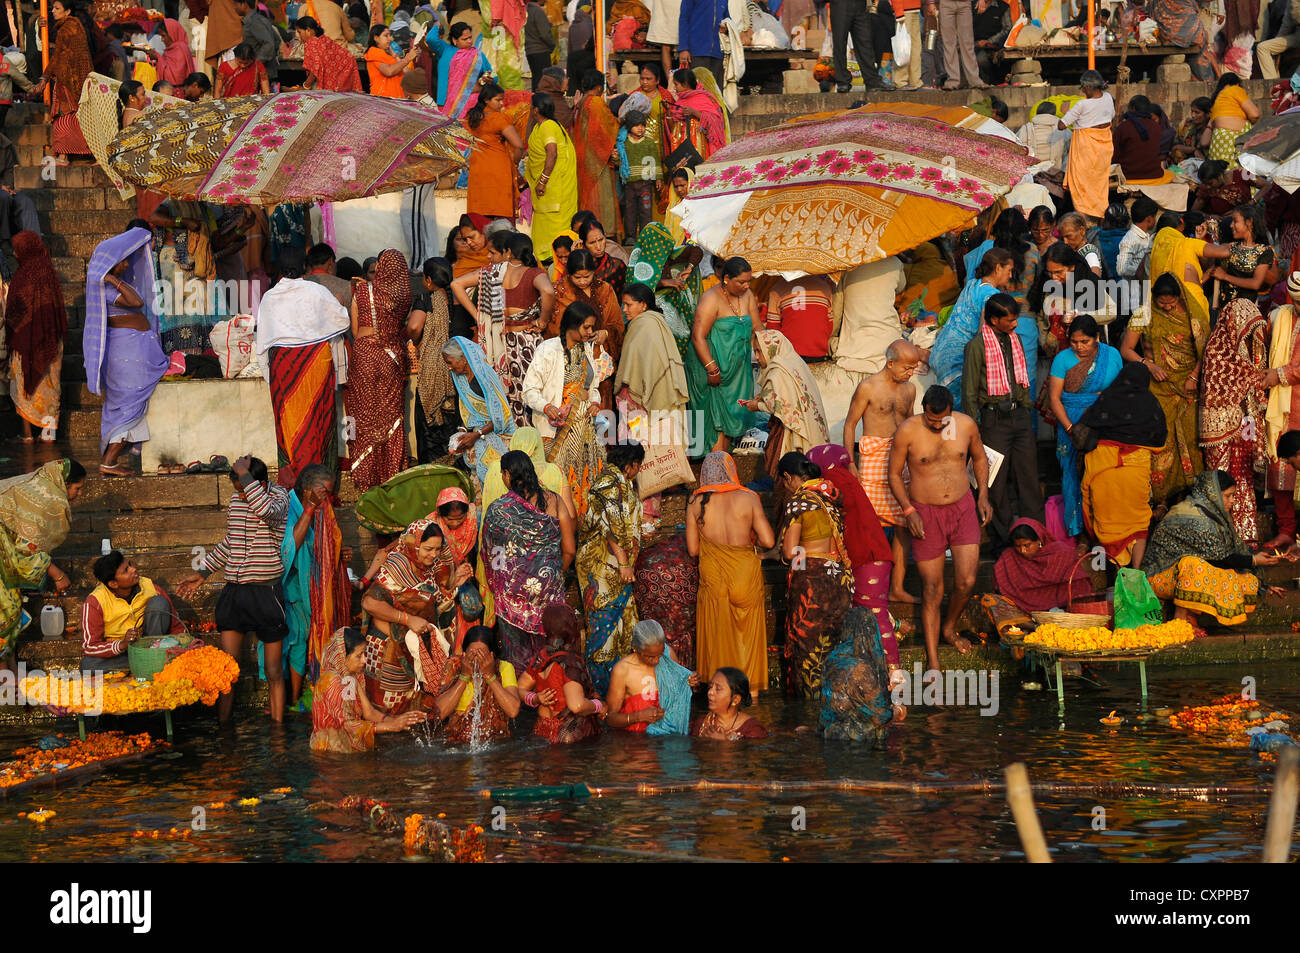 Asie Inde Uttar Pradesh Varanasi dévots Hindous sur les ghats du Gange Photo Stock